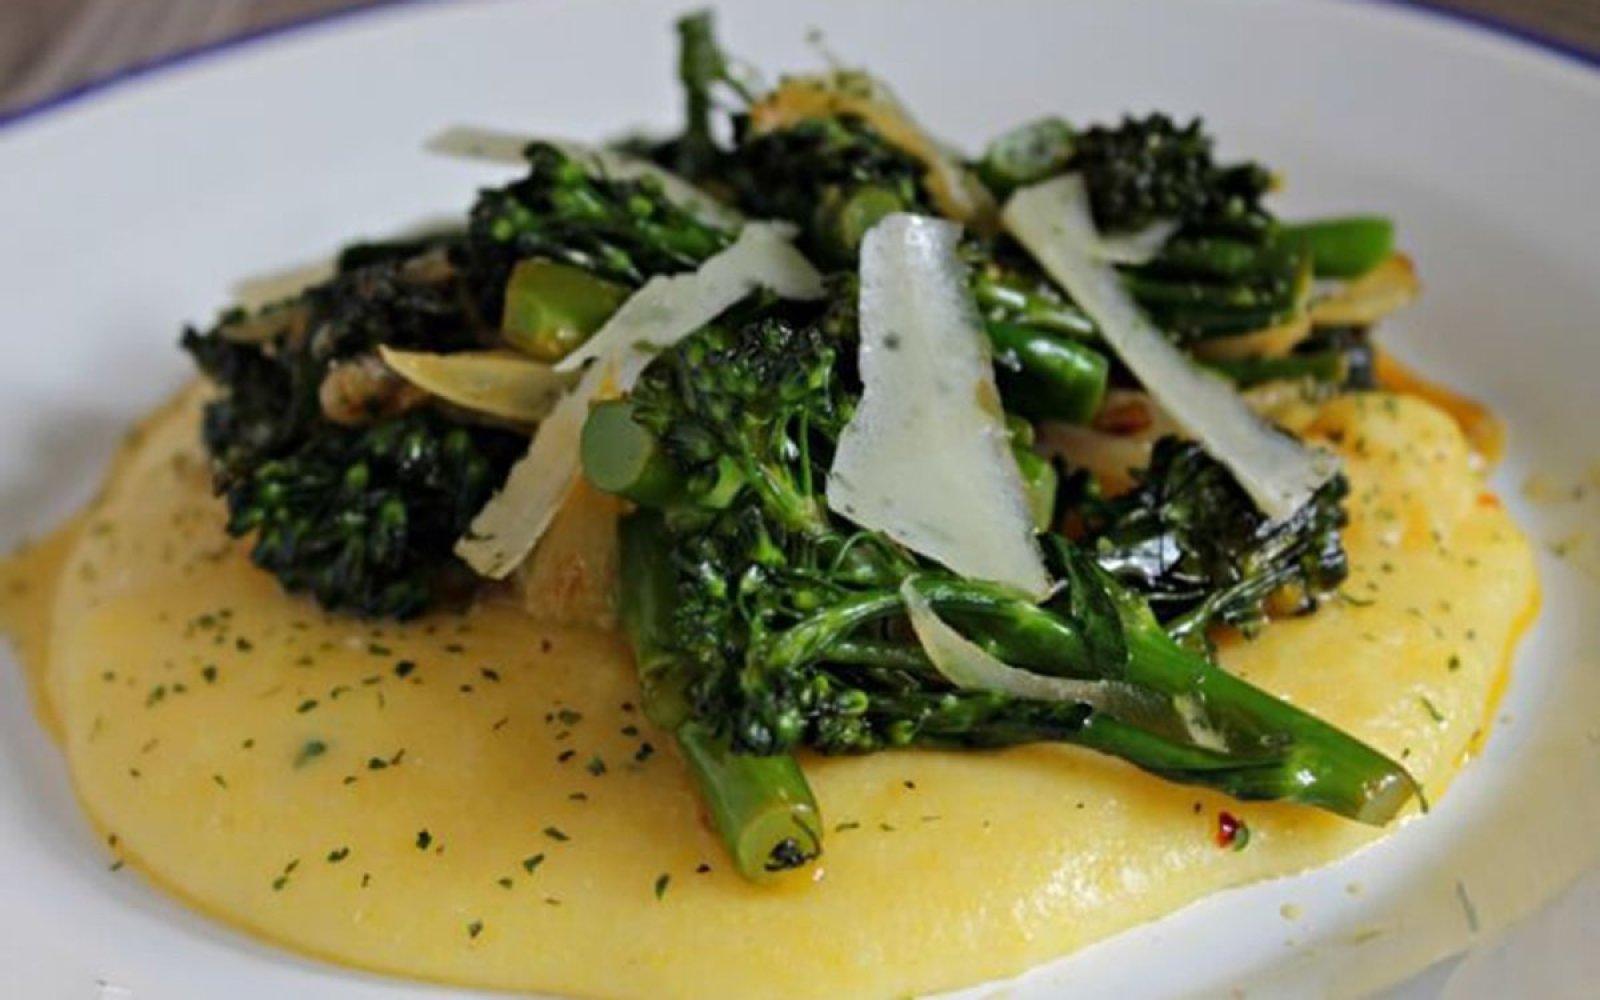 Cheesy Polenta With Hearty Greens [Vegan, Gluten-Free]